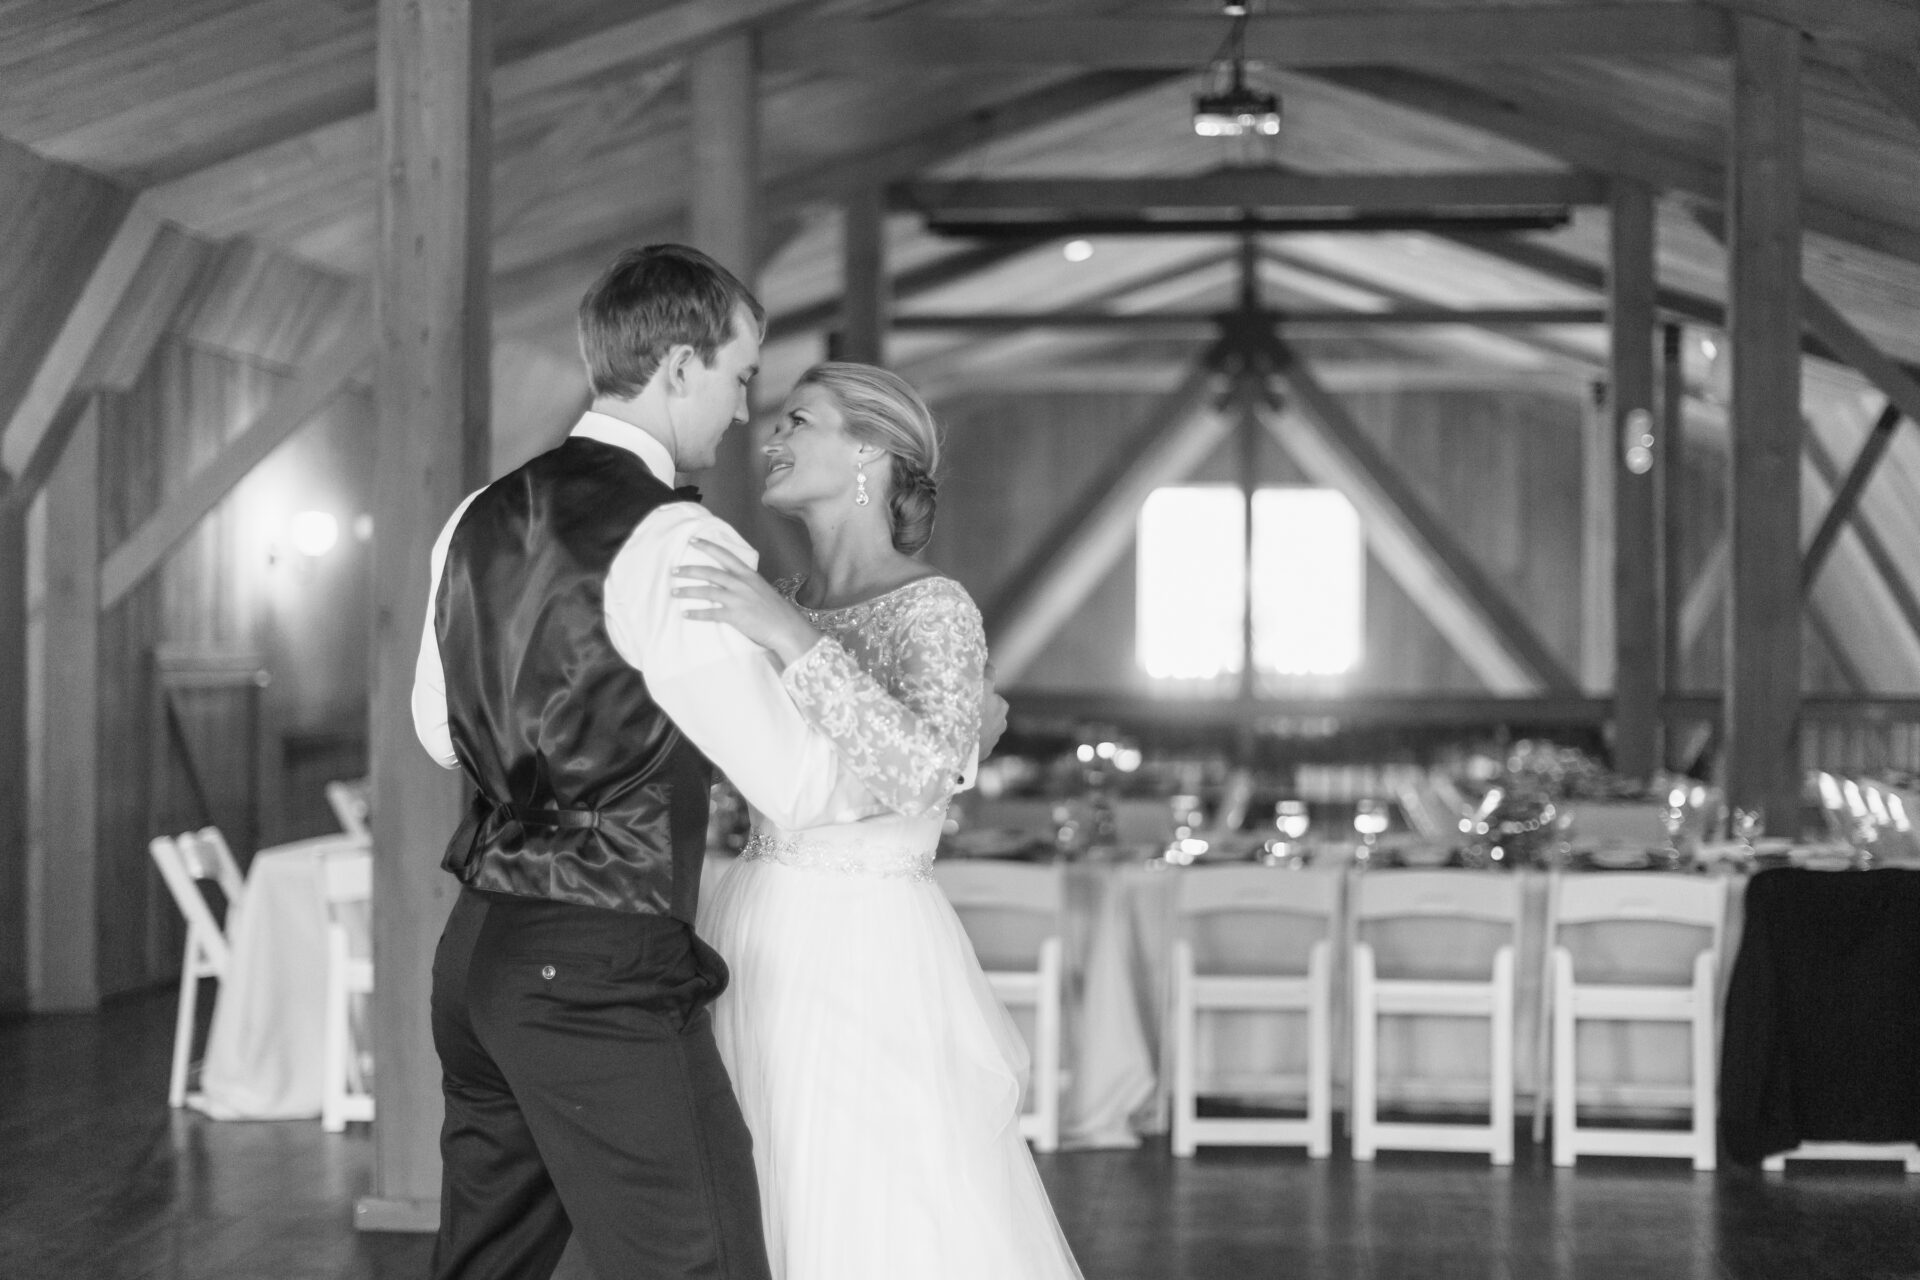 Wedding Dance Classes Social Style Dance Delafield Wi